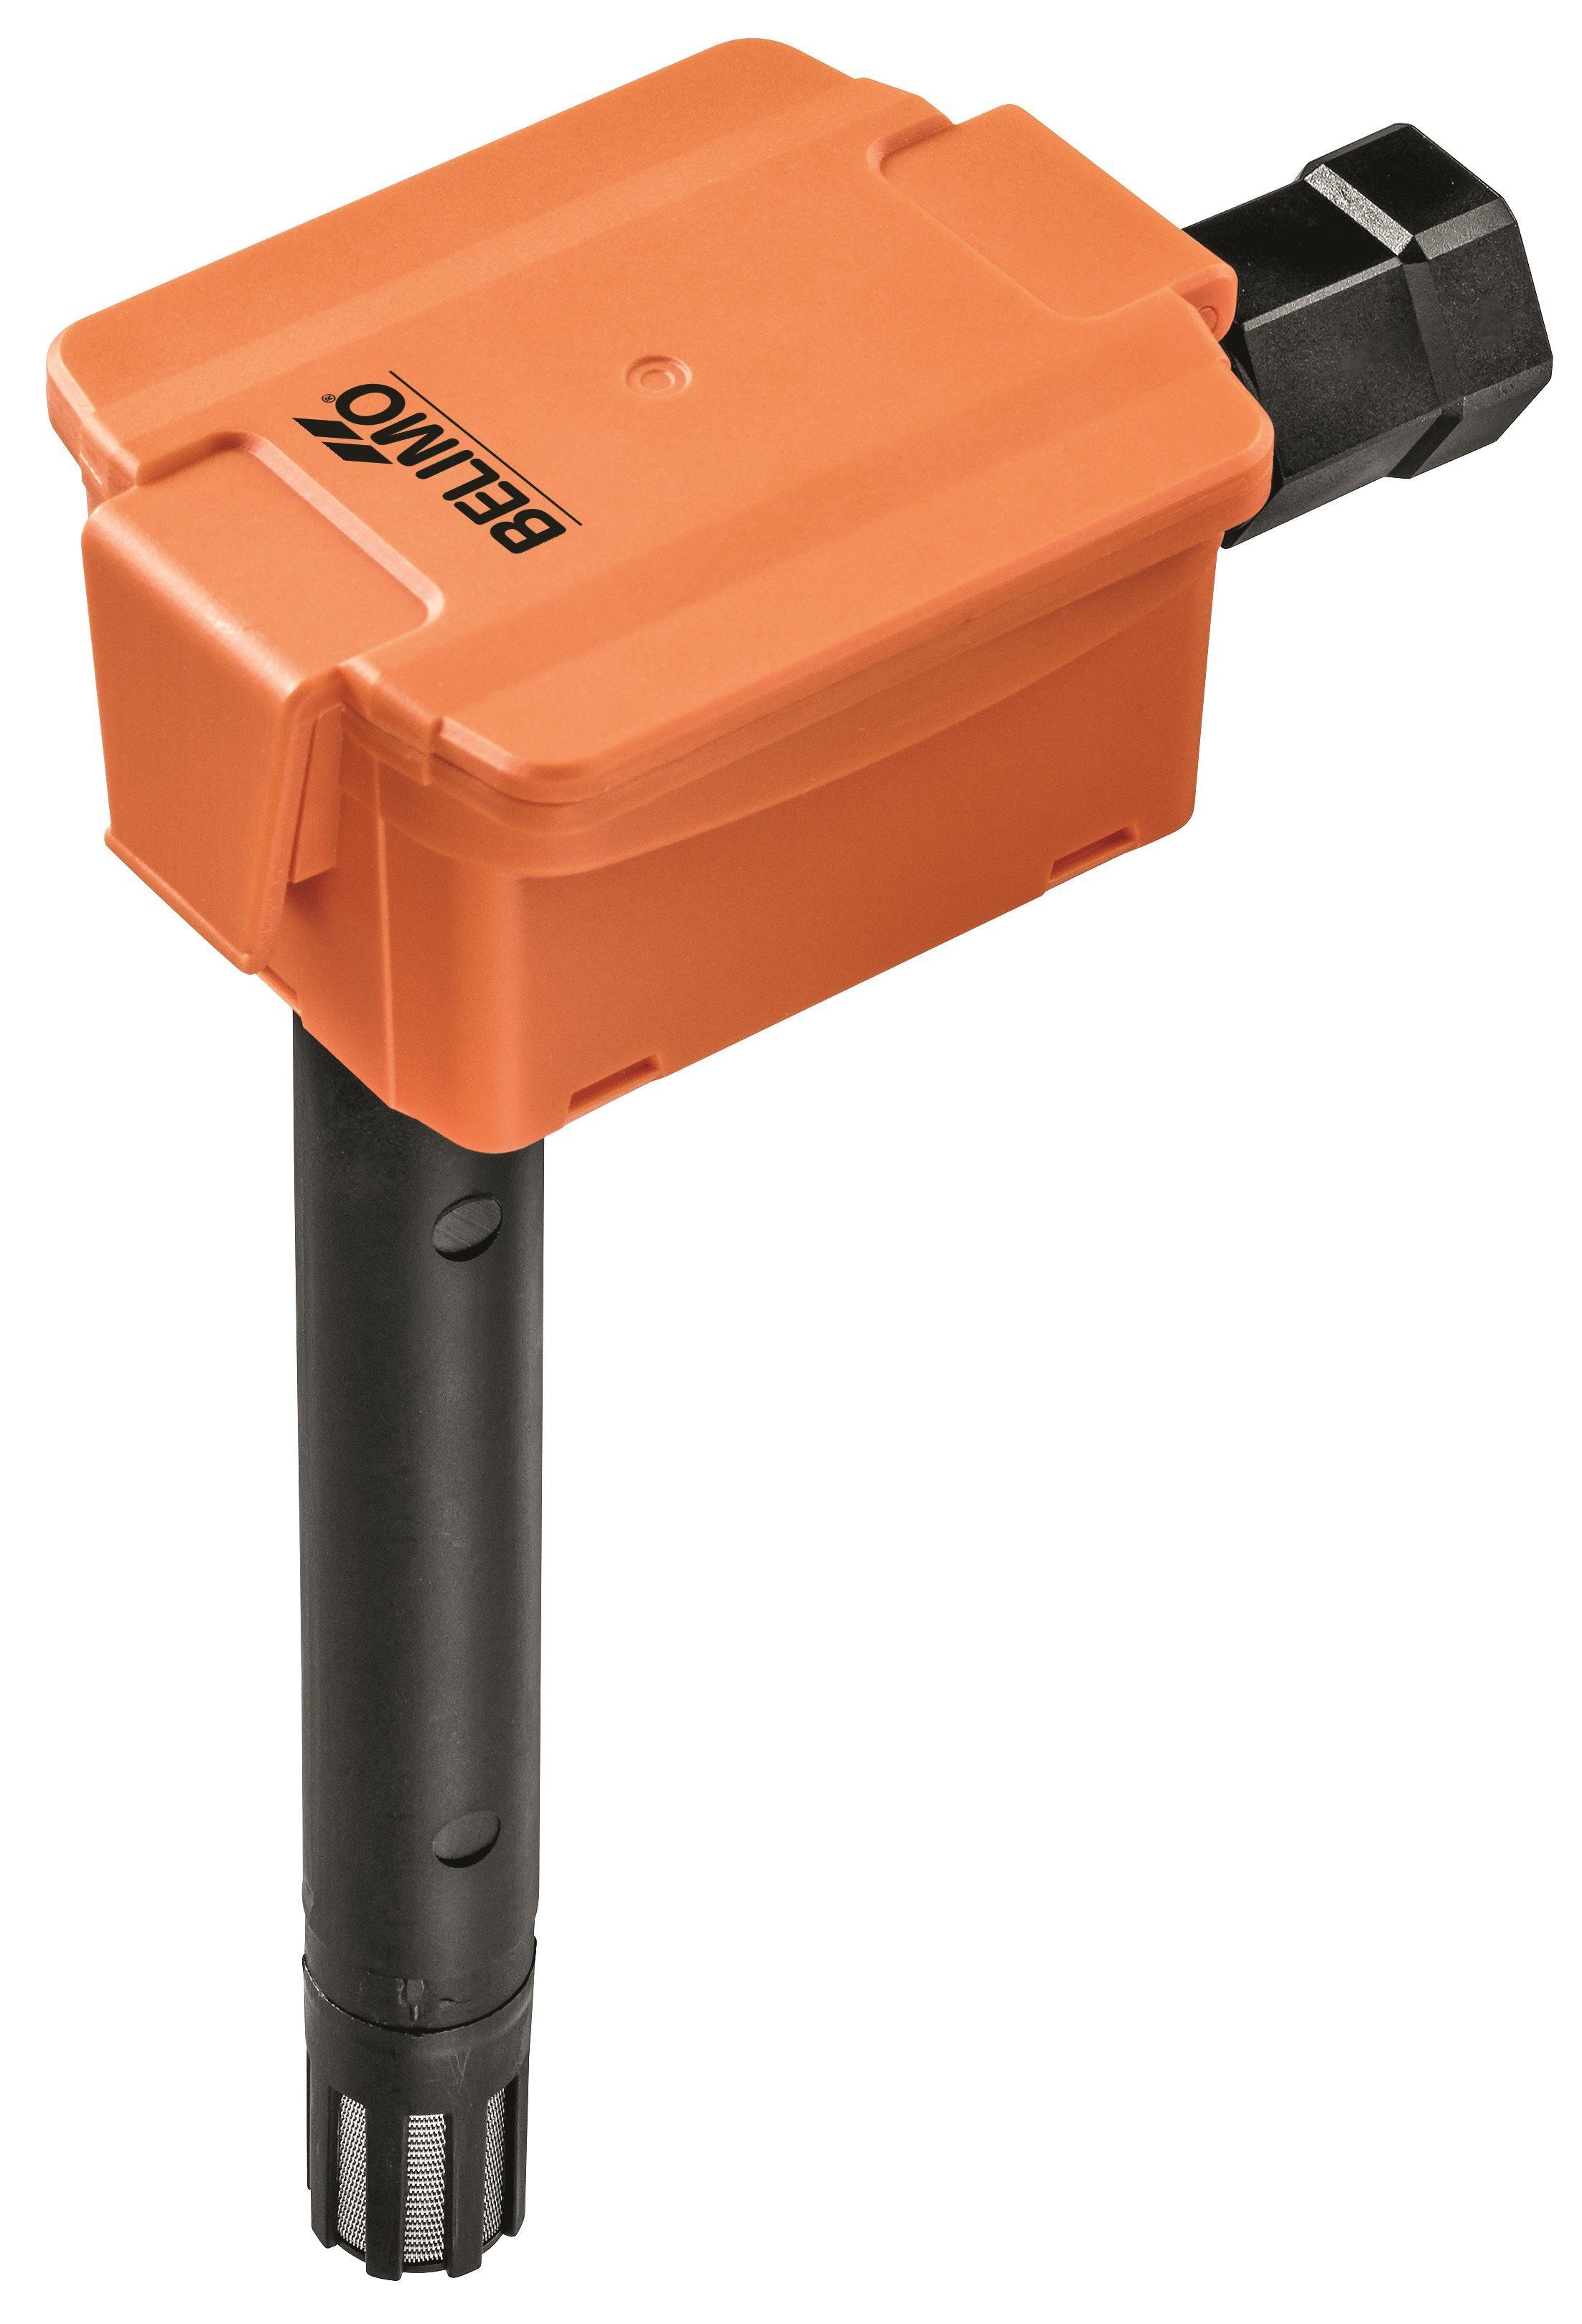 Belimo Belimo HVAC Sensors (2017) 22DTH-53ML Sensors